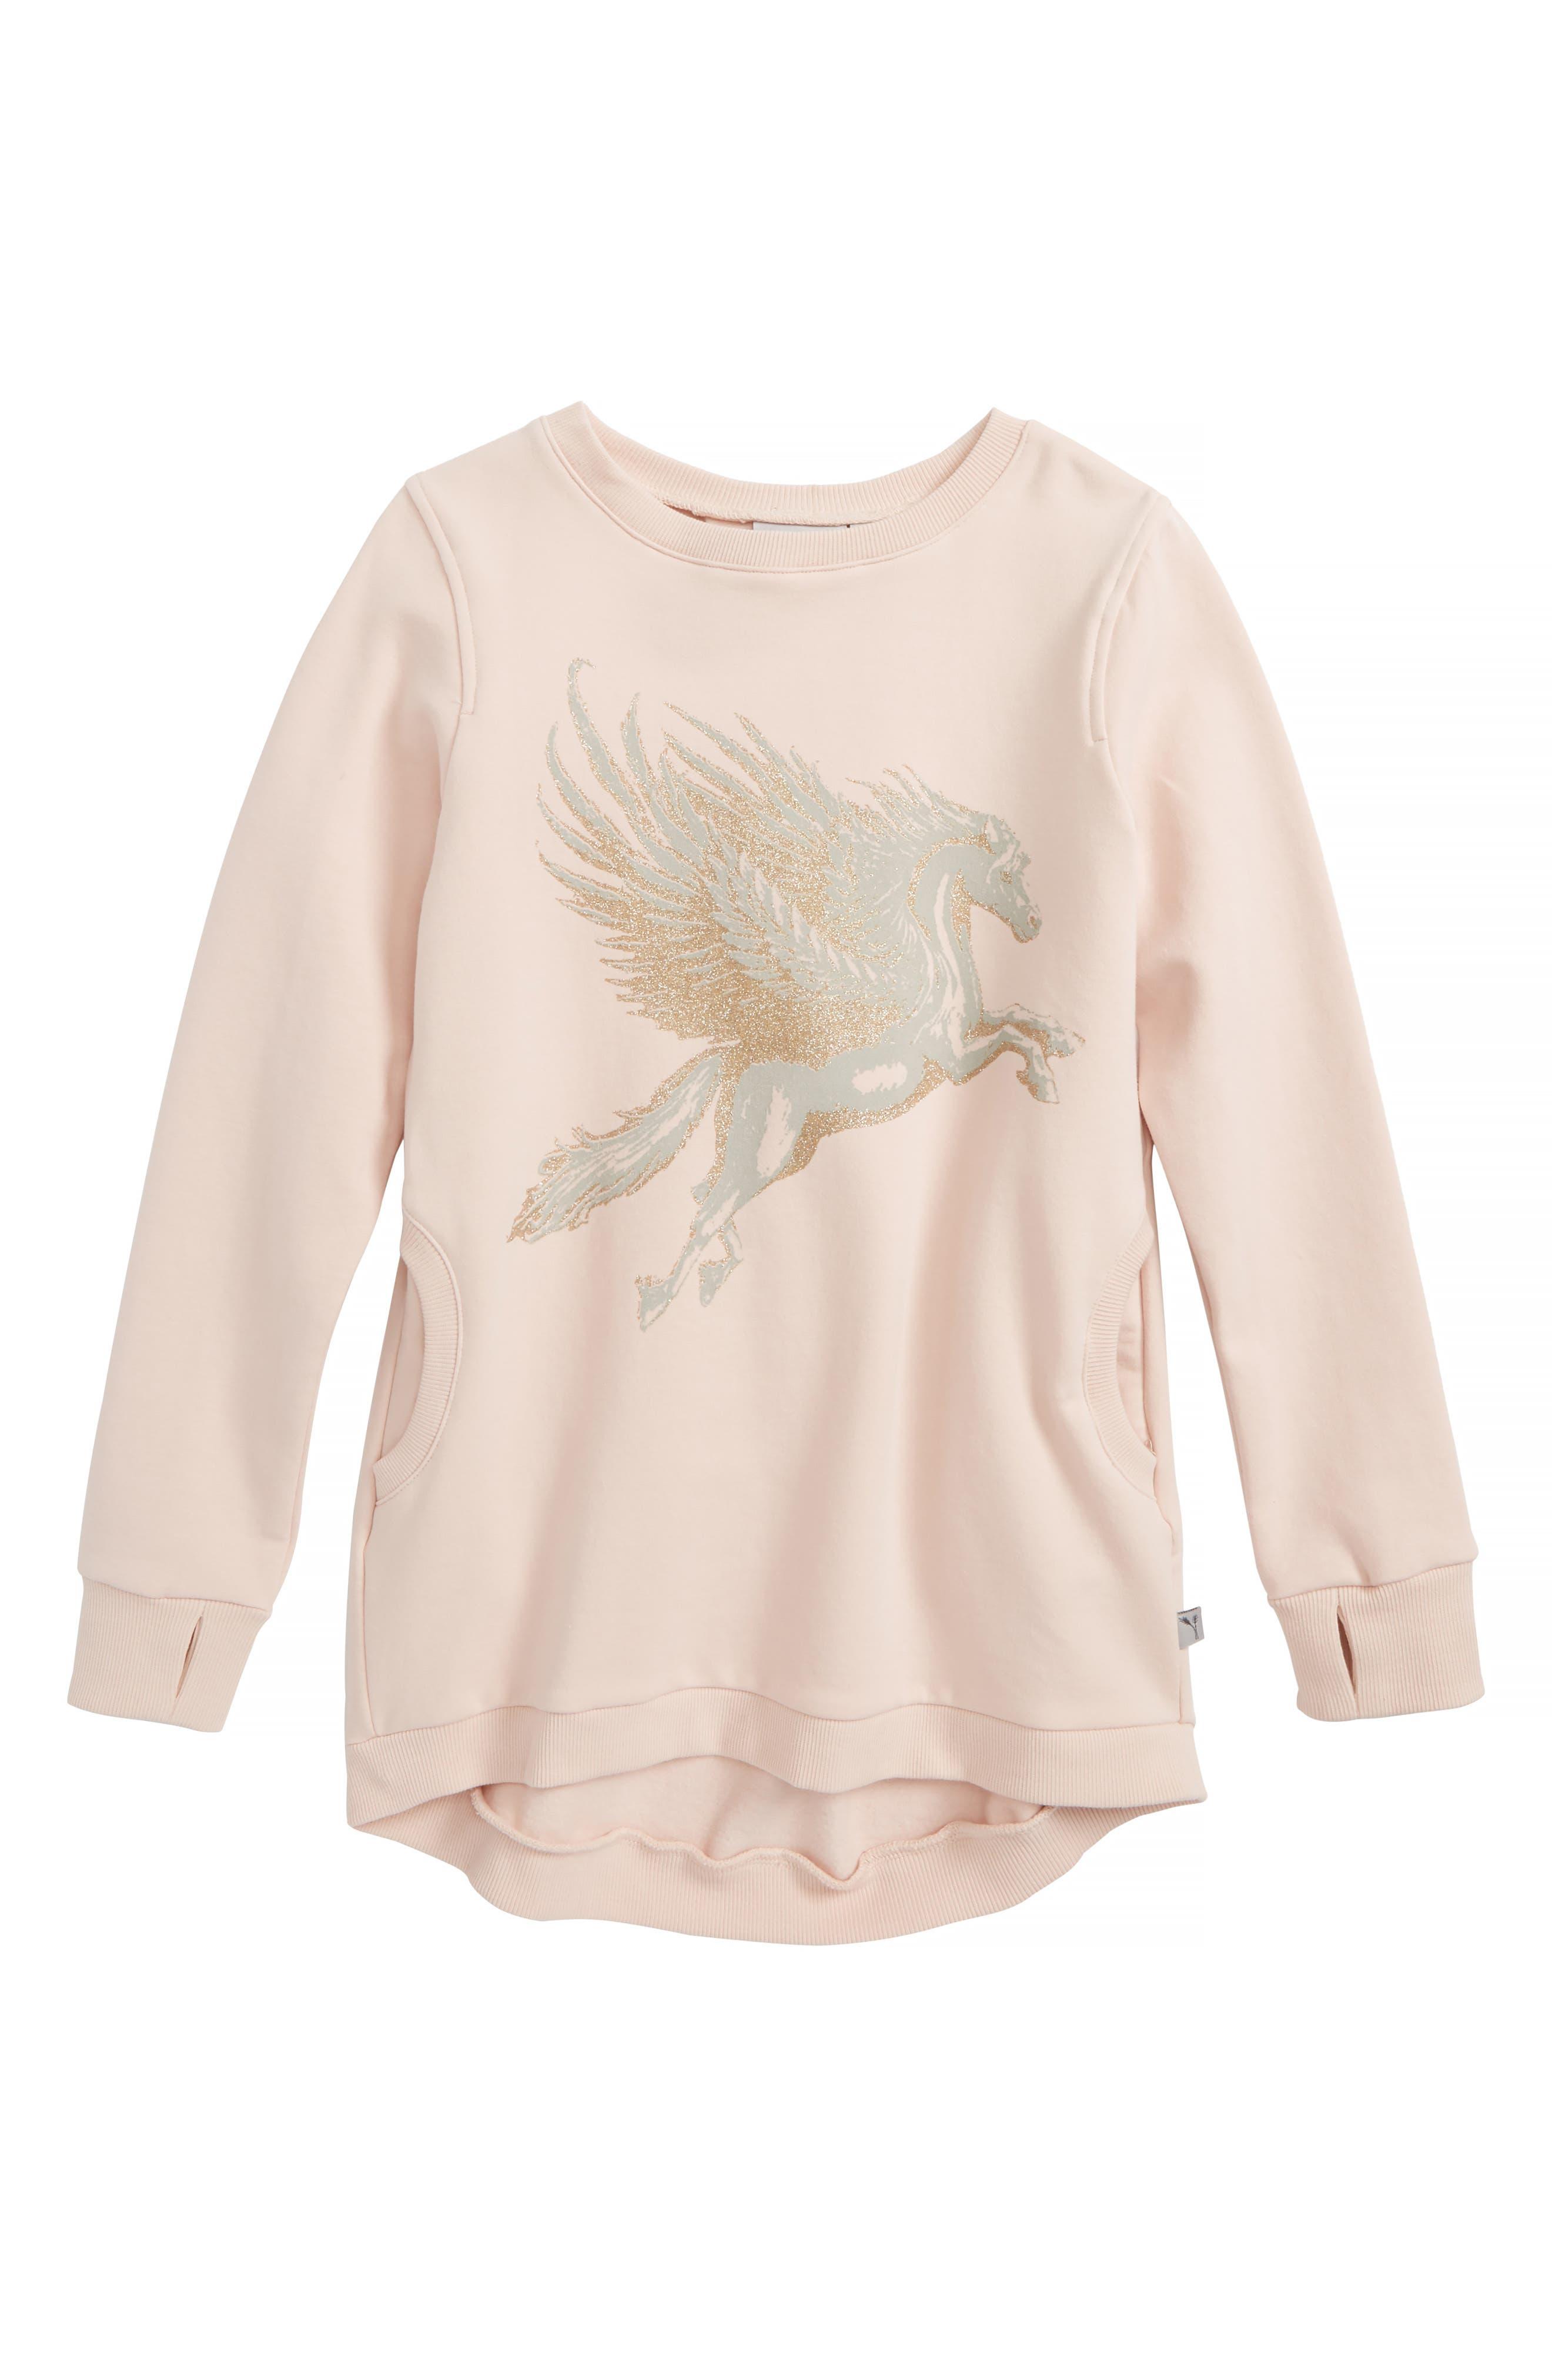 Glitter Graphic Sweatshirt,                         Main,                         color, 2400 Powder